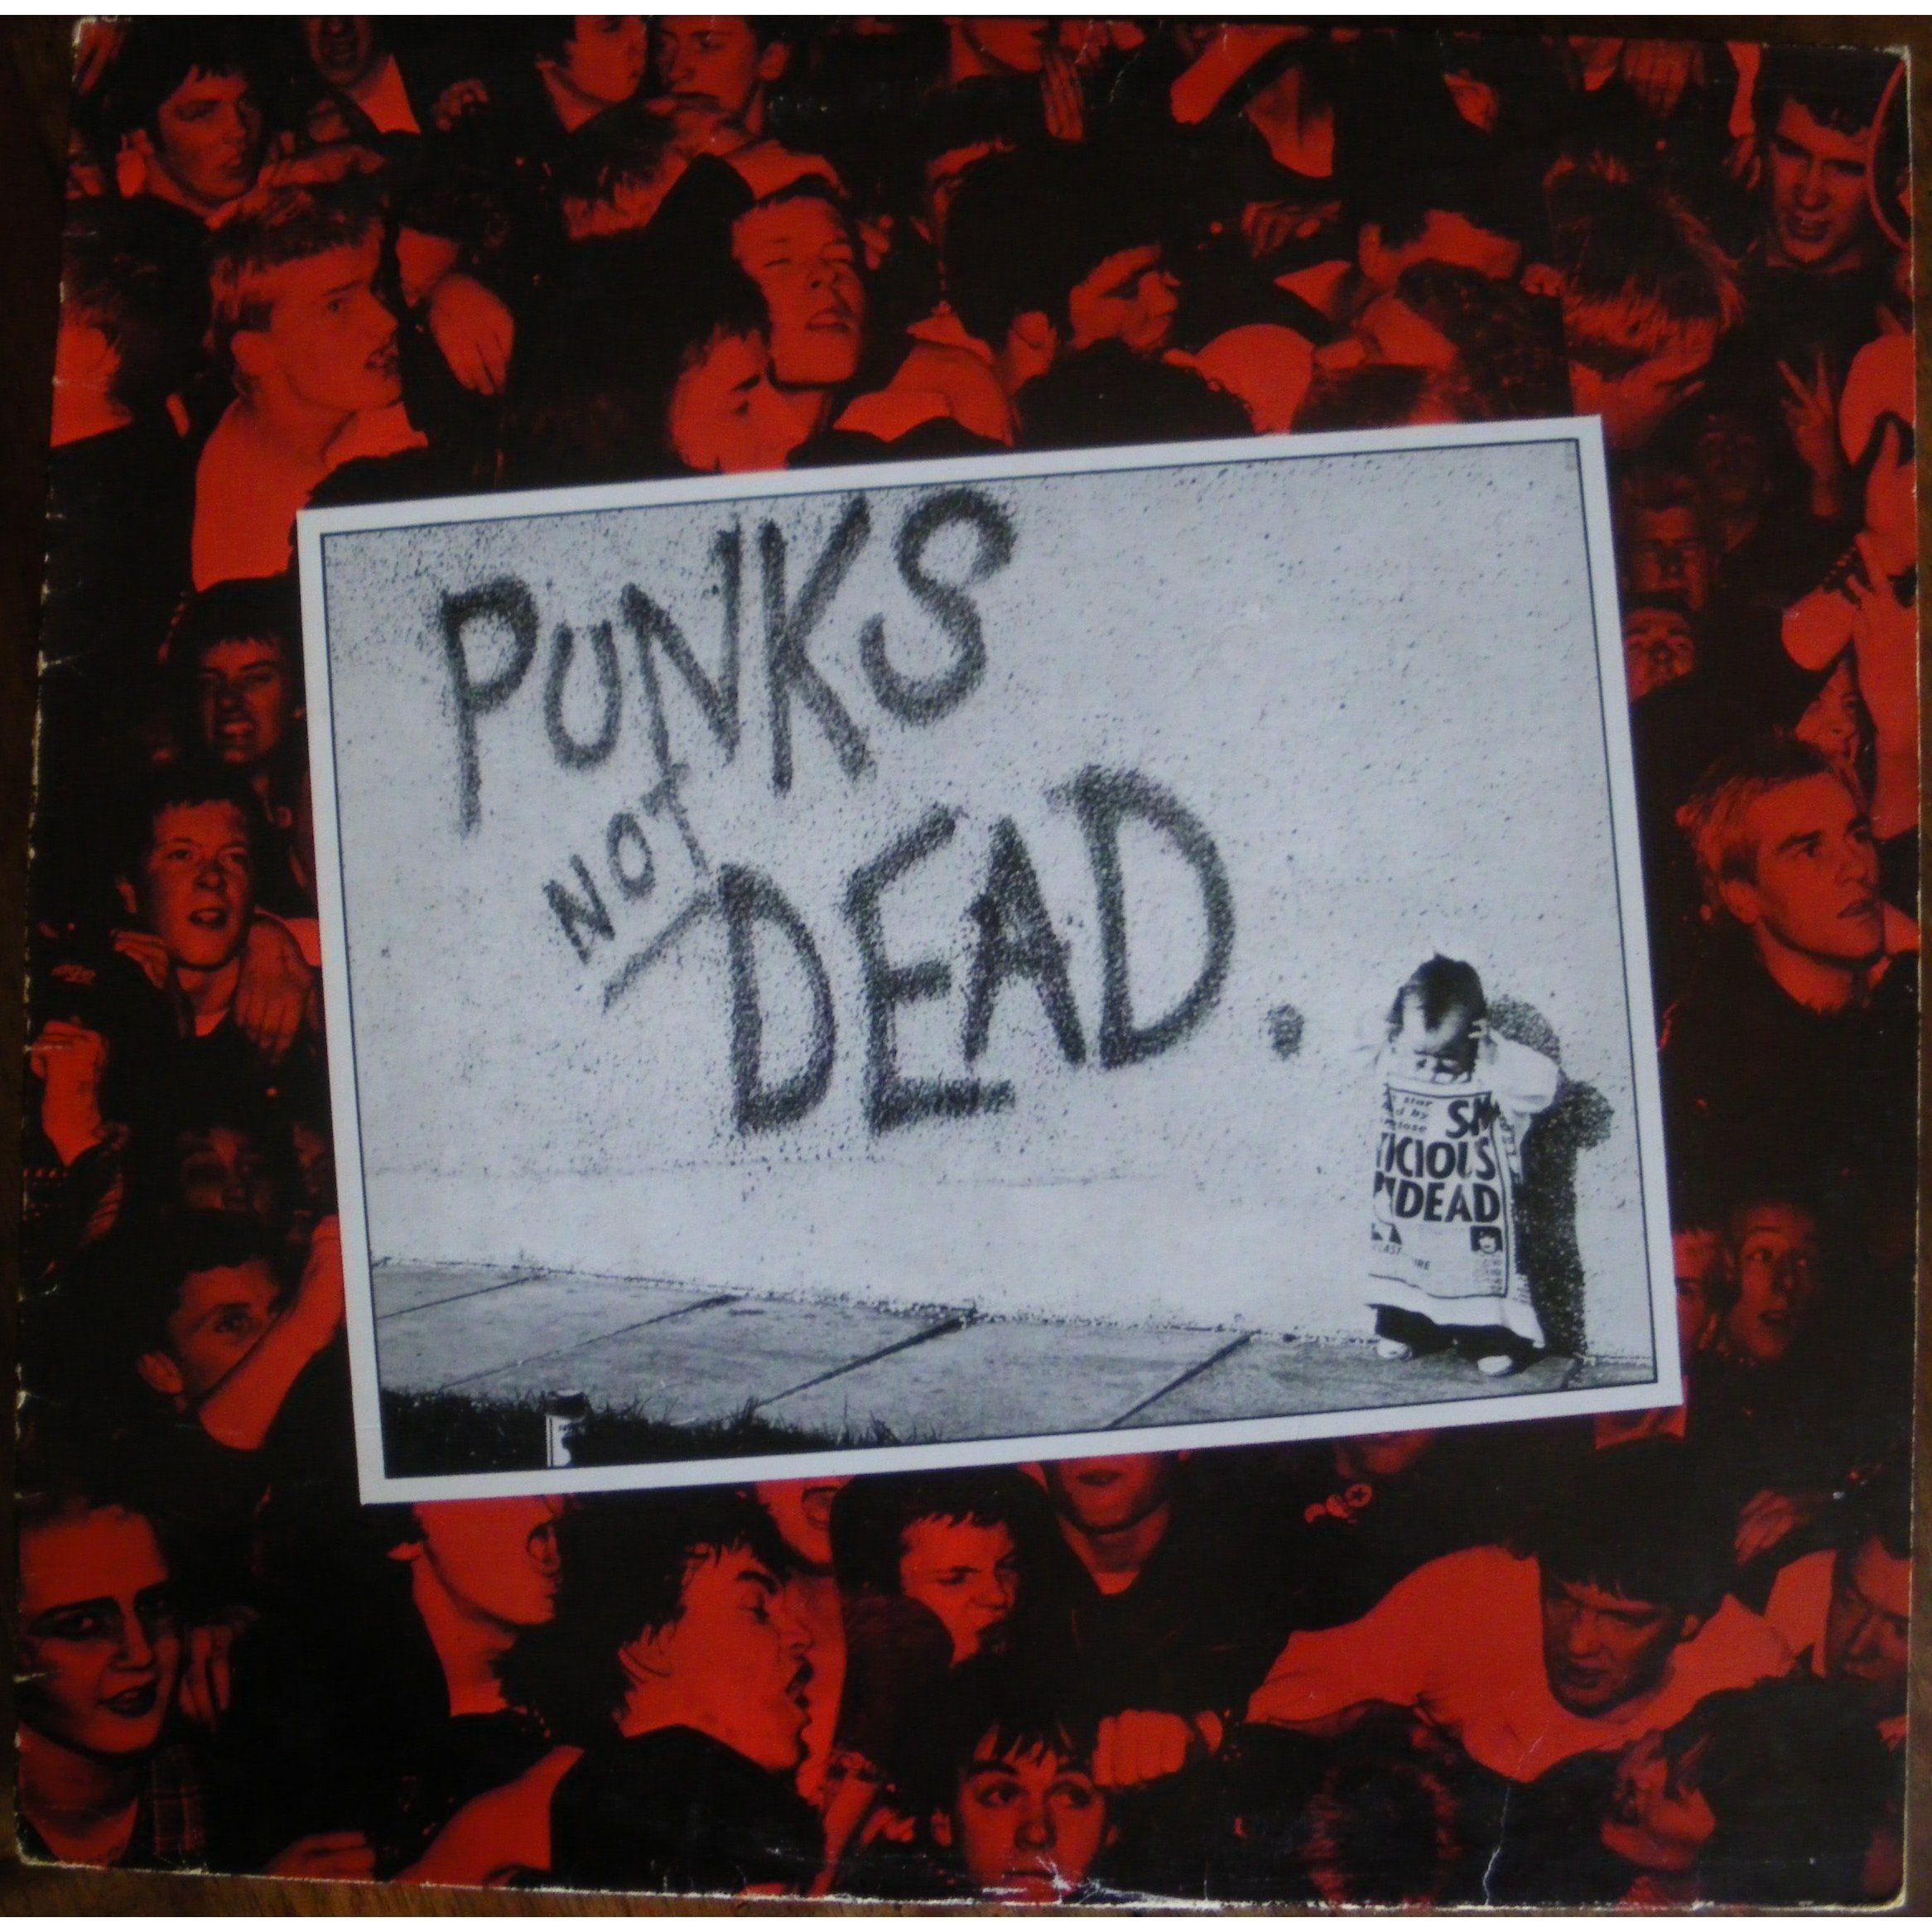 The Exploited Punk S Not Dead 1981 Vinyl Punks Not Dead Punk Punk Rock